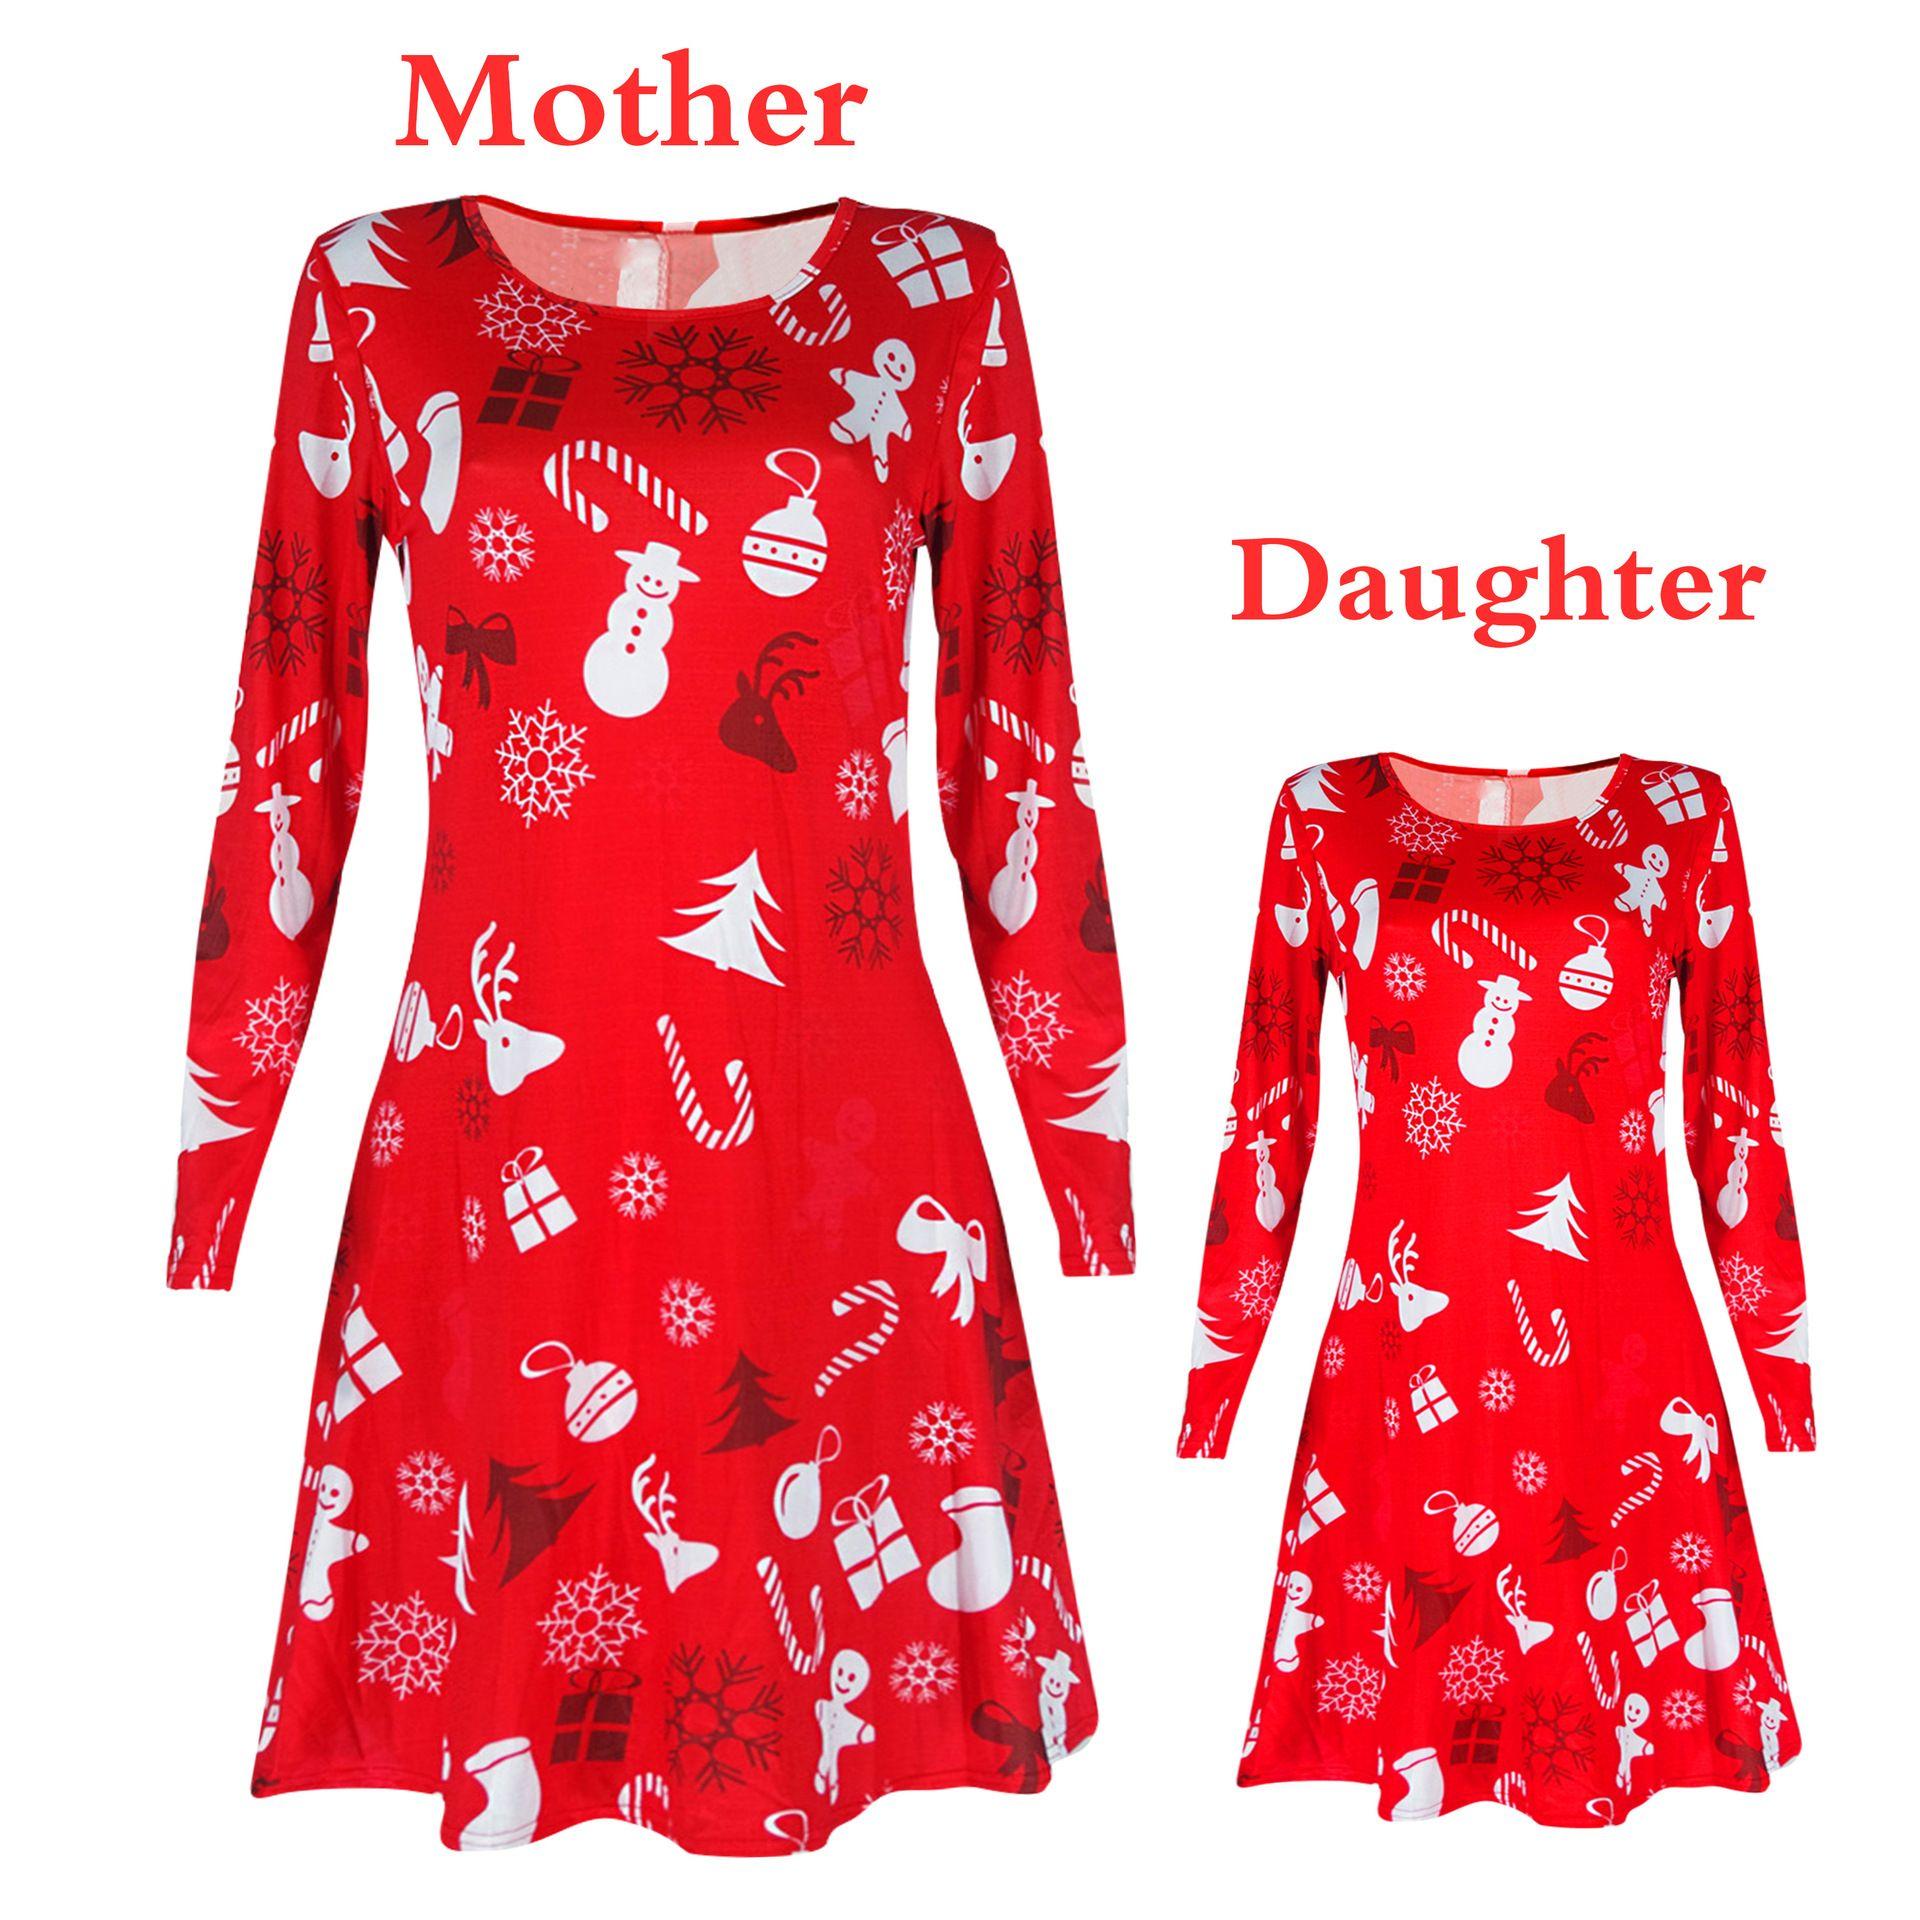 Xmas Family Matching Clothes Mother Daughter Long Sleeve Dress Women Girls Dress